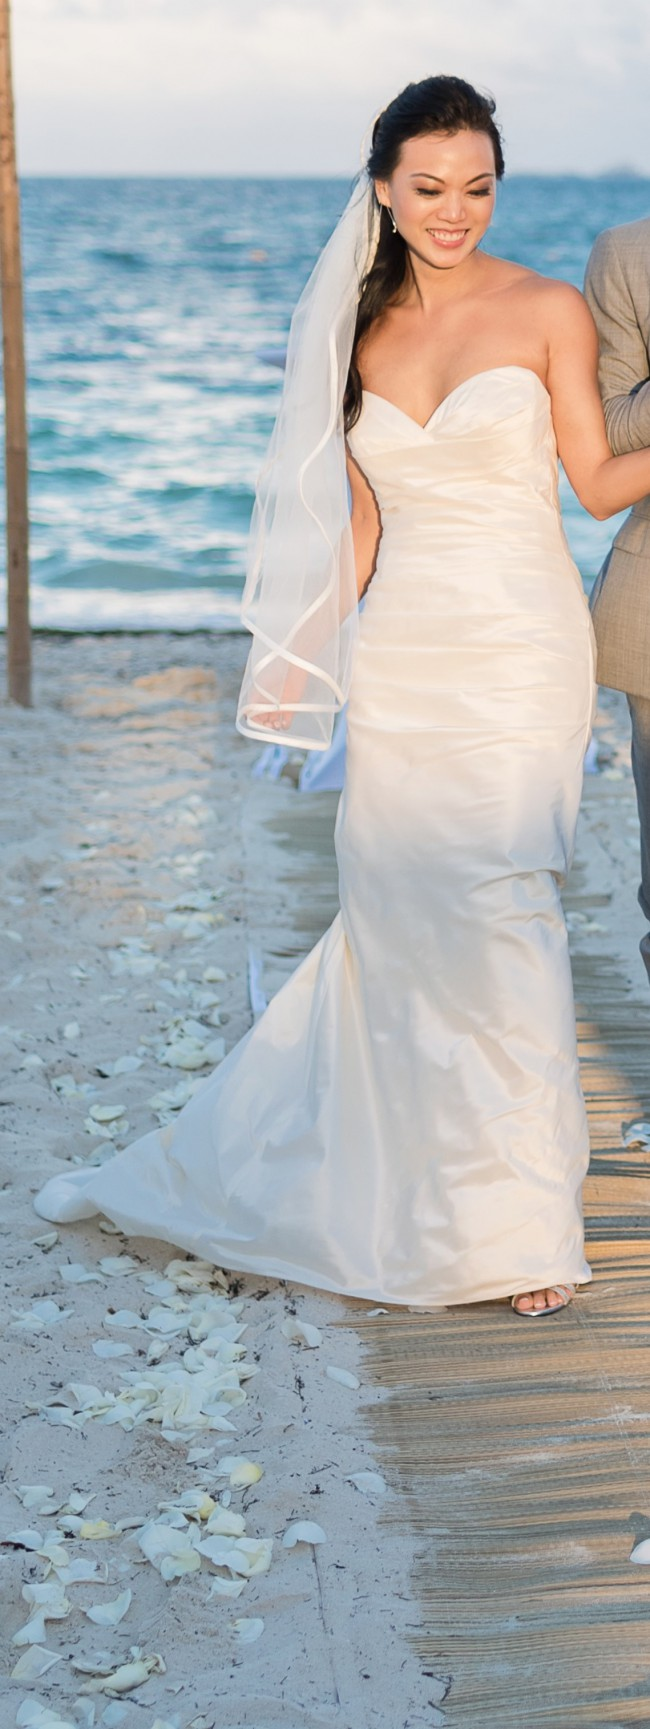 Beautiful Preowned Wedding Dresses Vignette - All Wedding Dresses ...